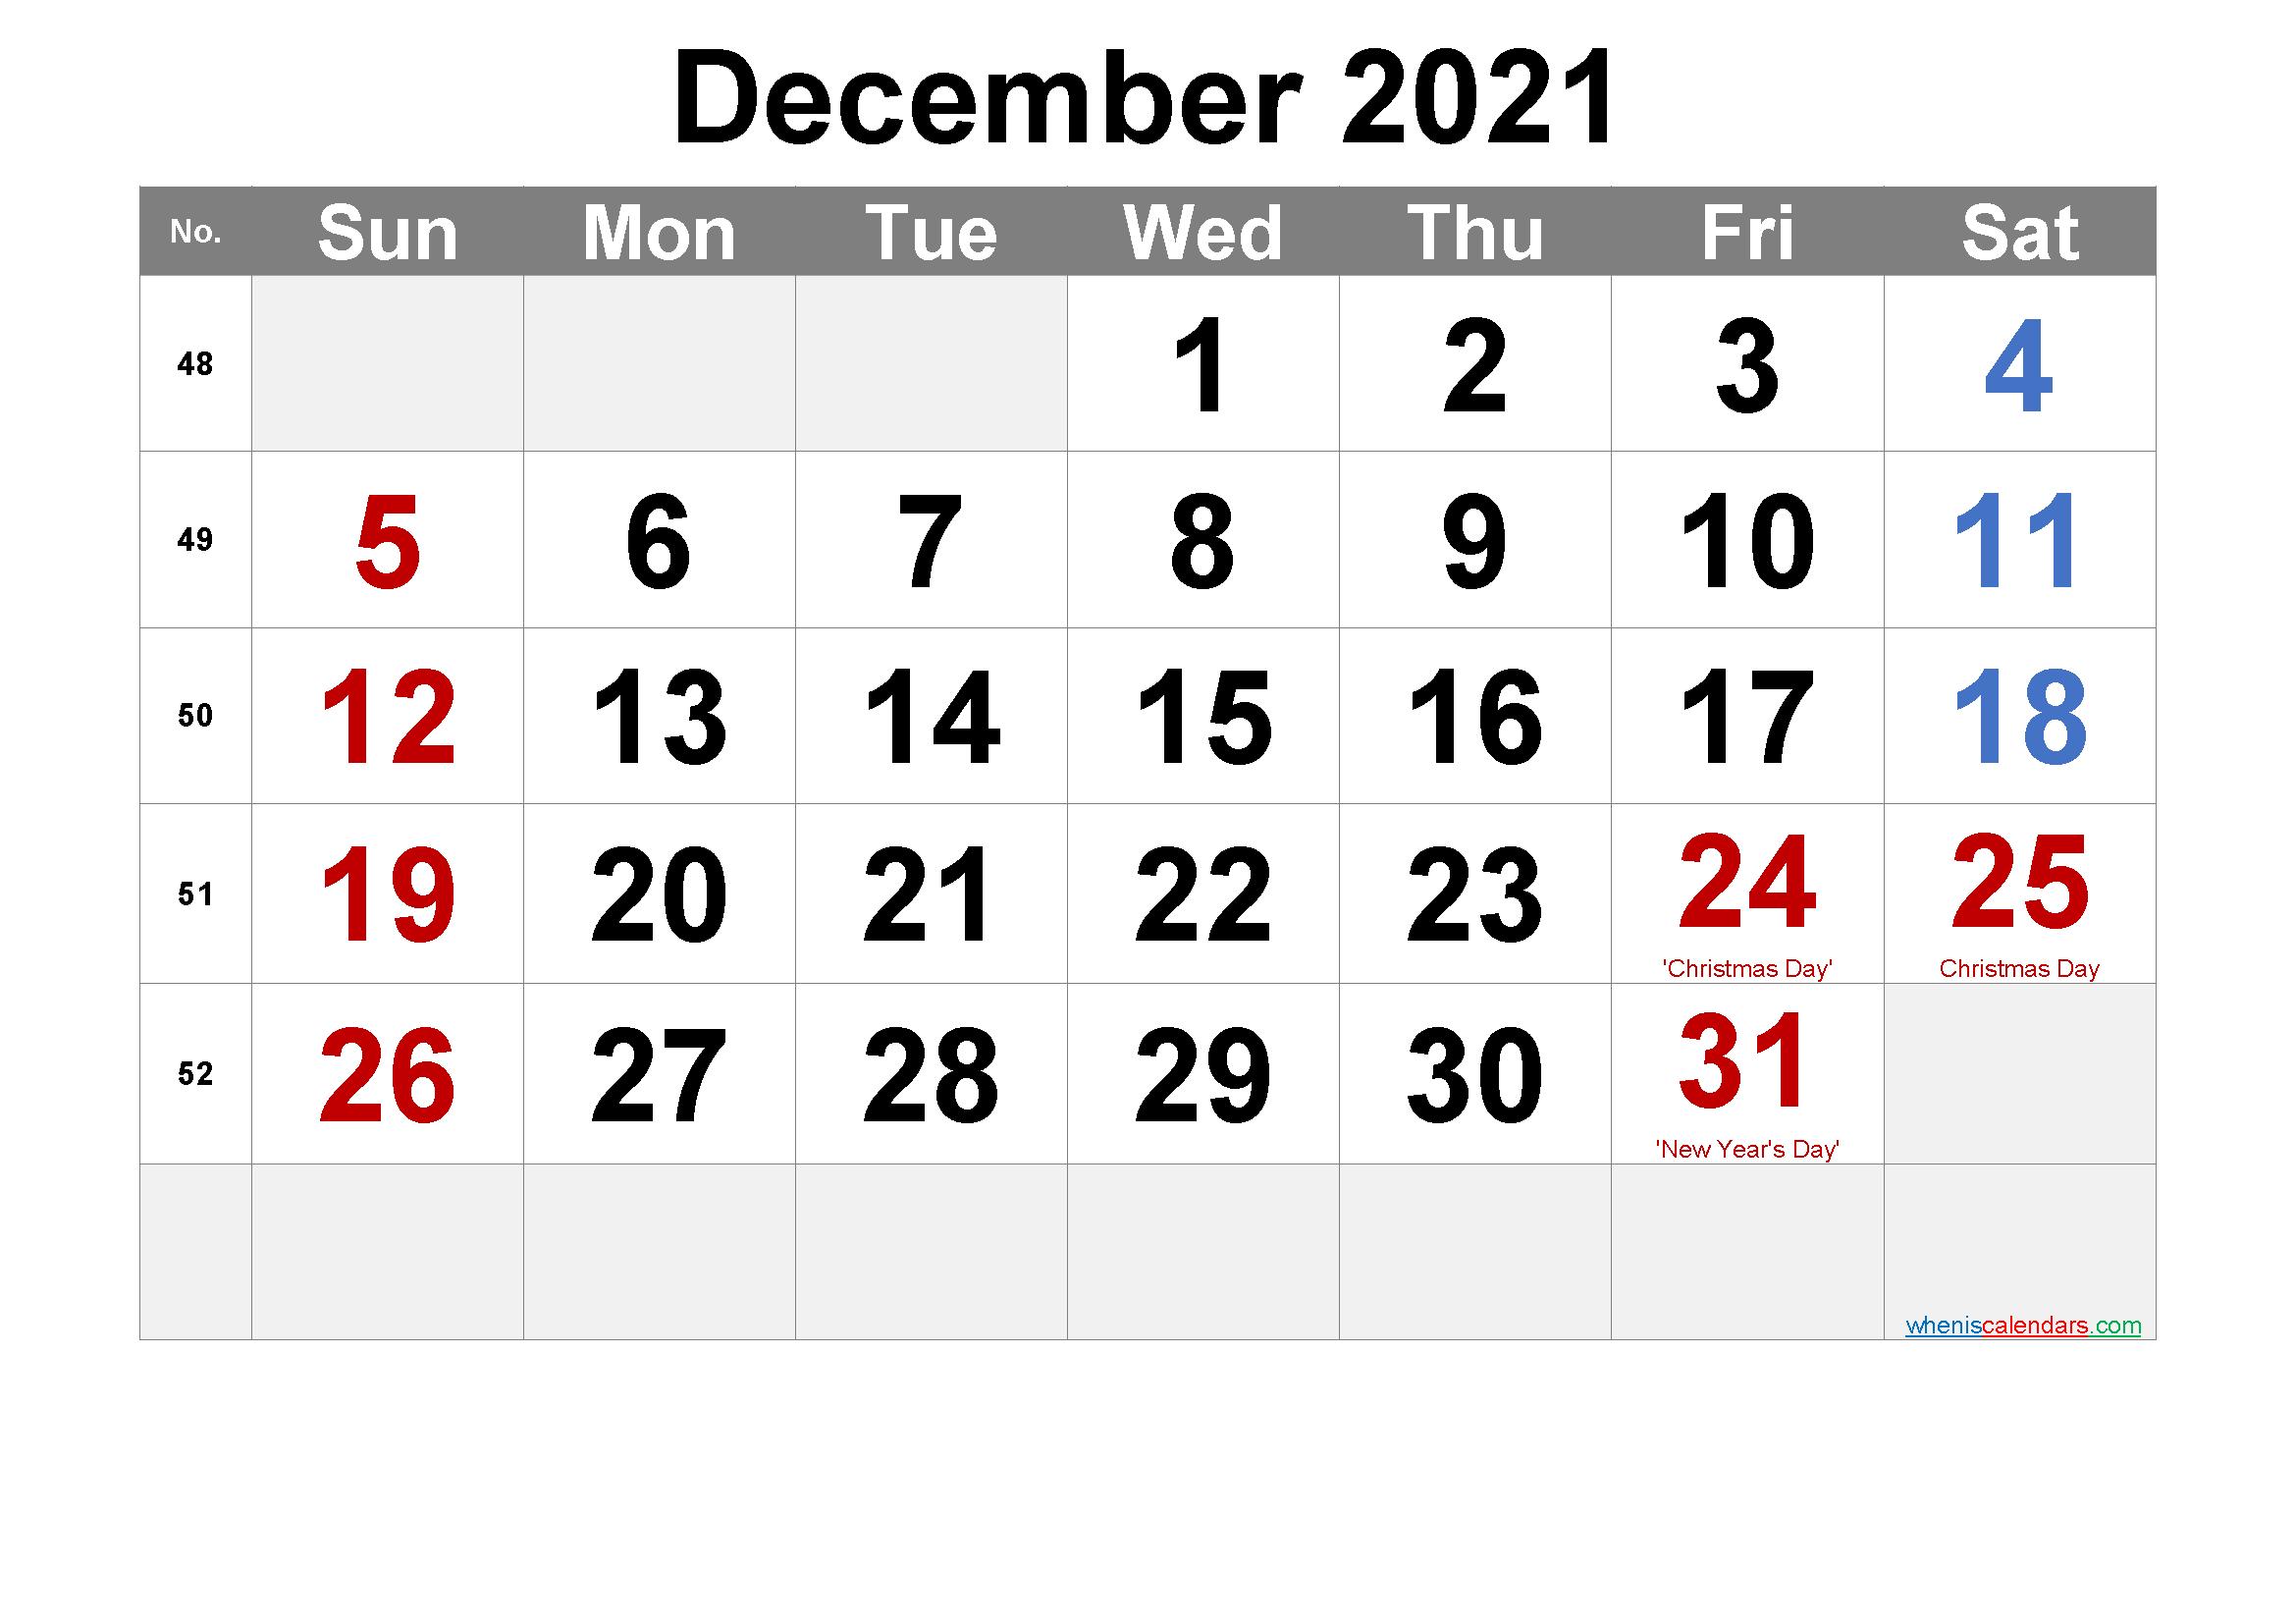 December 2021 Printable Calendar With Holidays - 6 Templates